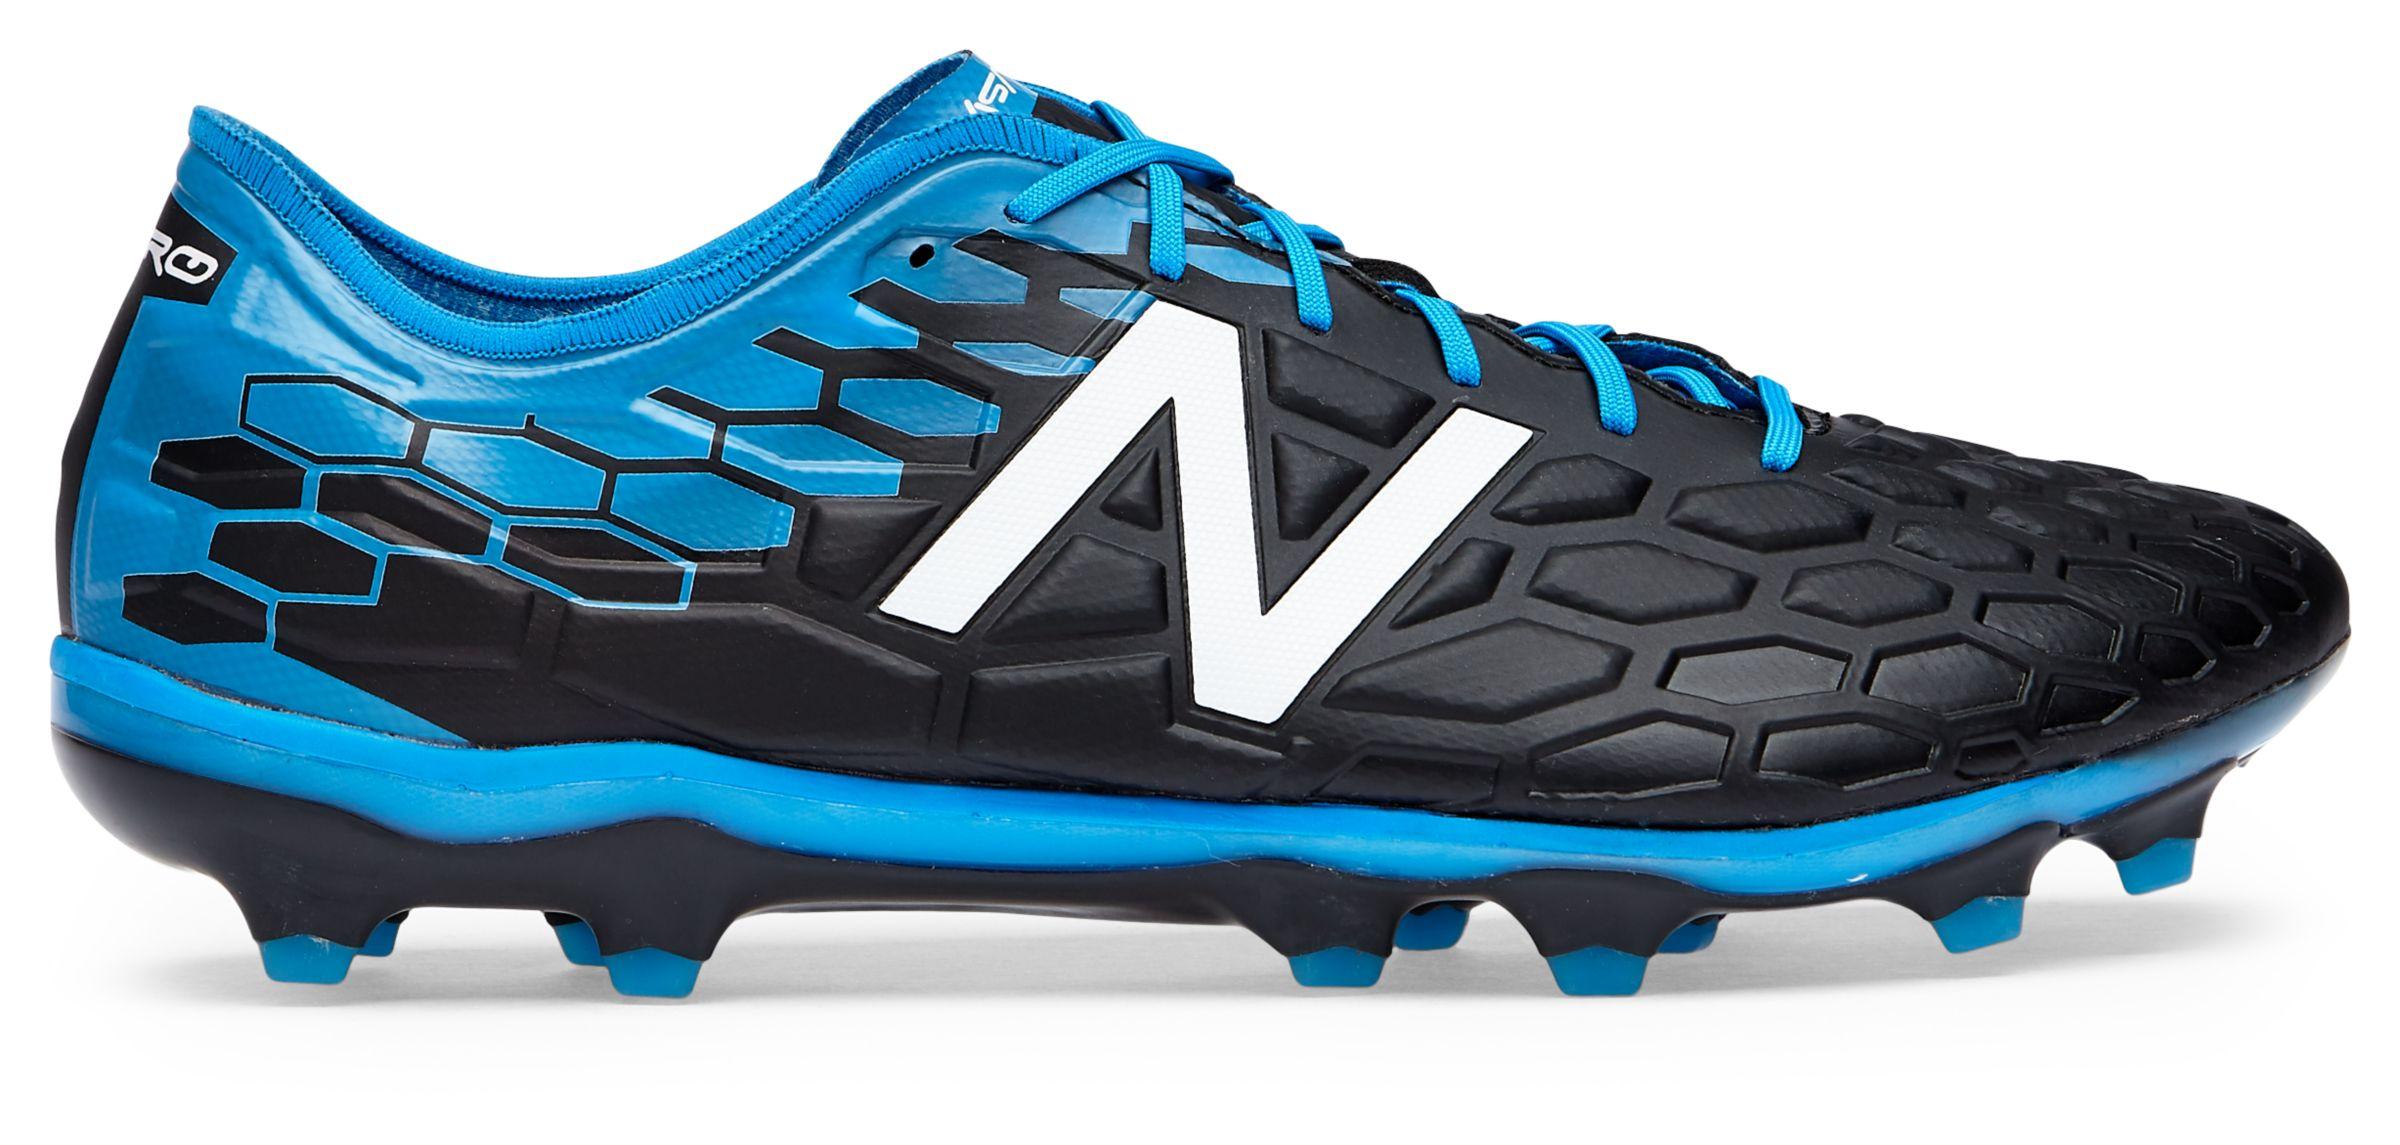 New Balance FG Men's Visaro 2.0 Pro FG Balance Shoes Black with Blue & Red dc2db1